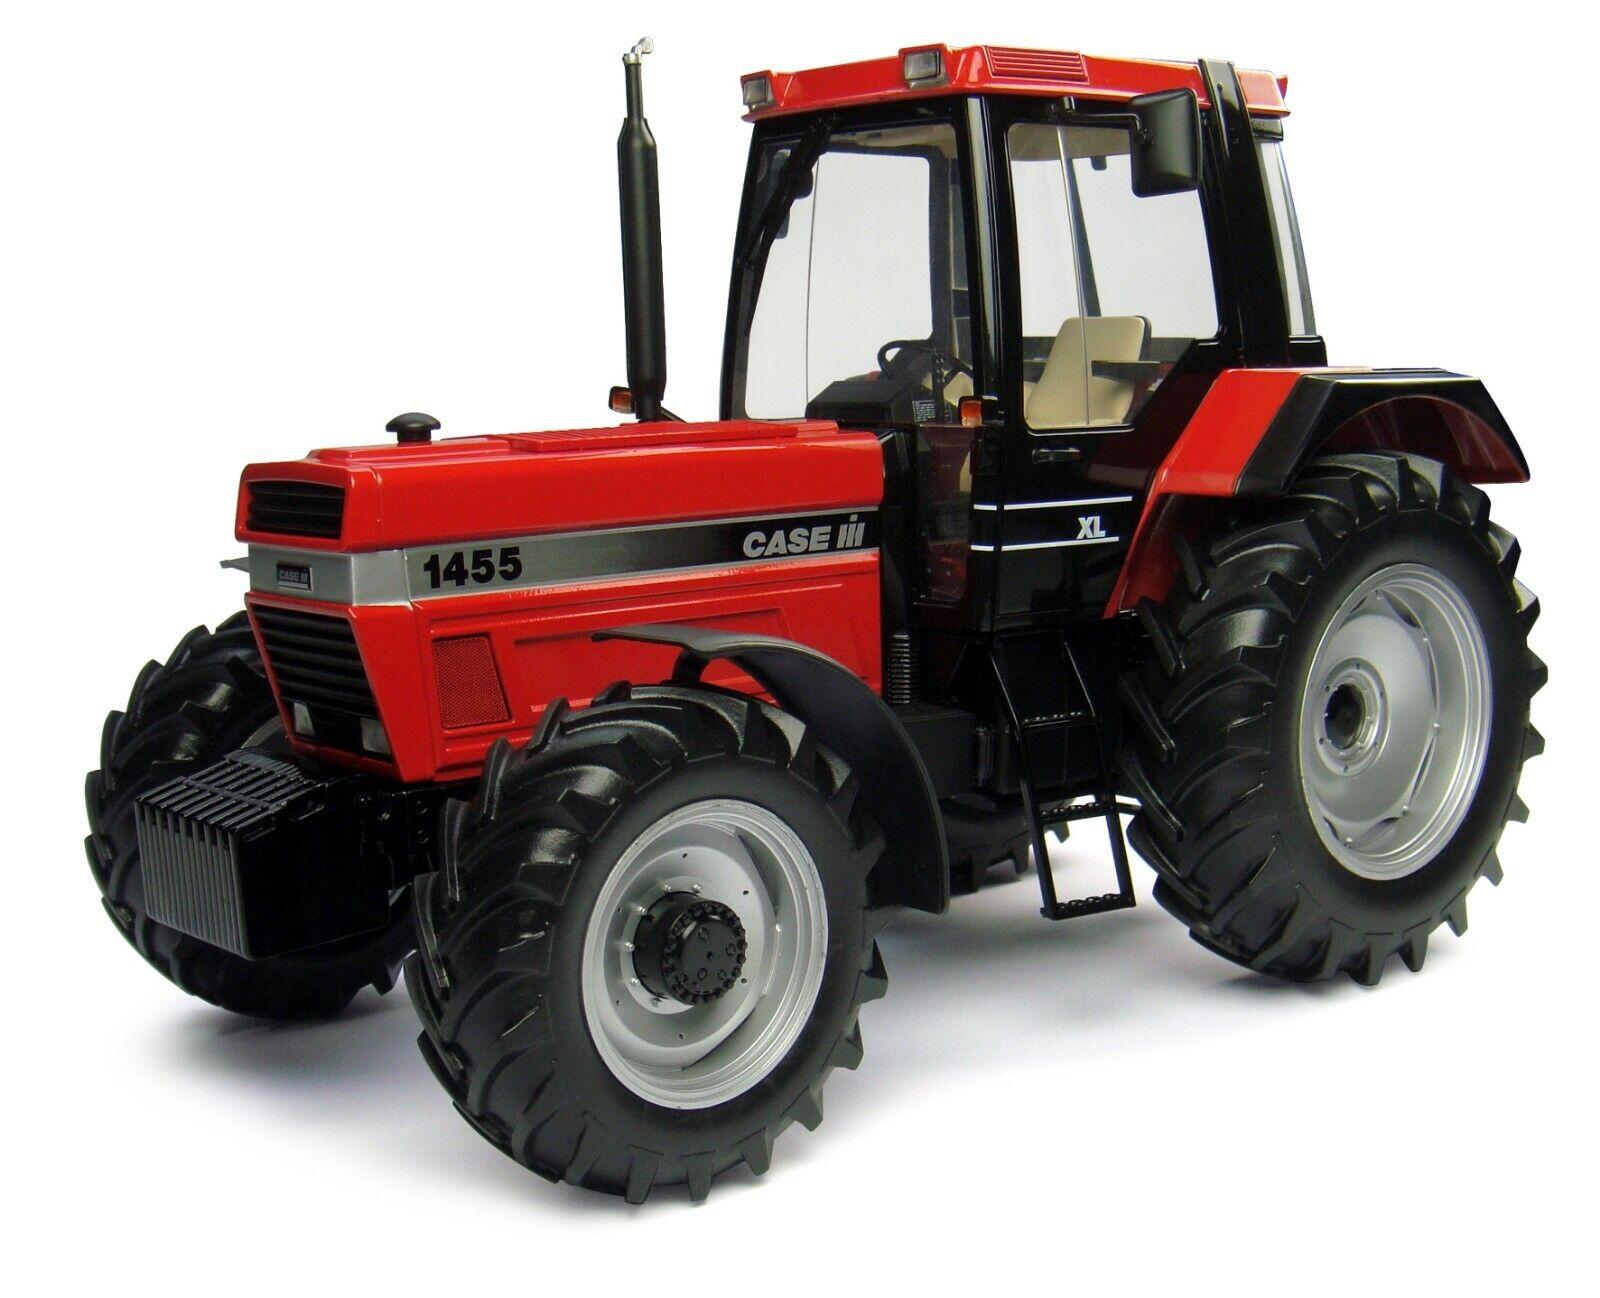 1996 Case IH Tractor 1455XL 4TH Gen. Limited 1 16 Diecast Universal Hobbies UH4168